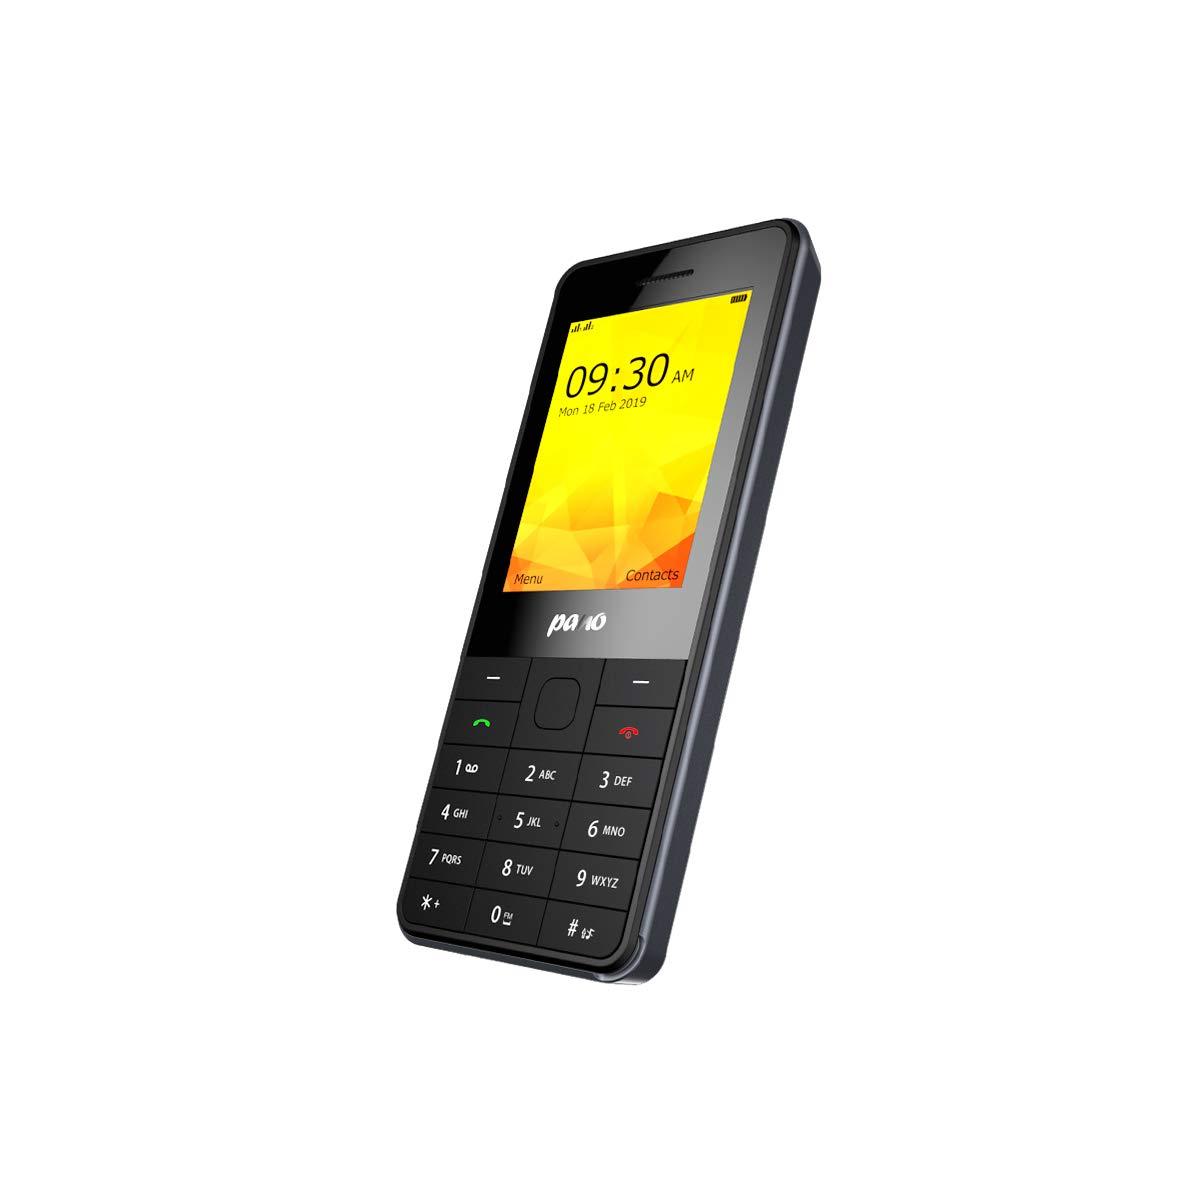 Utilissimo telefono cellulare